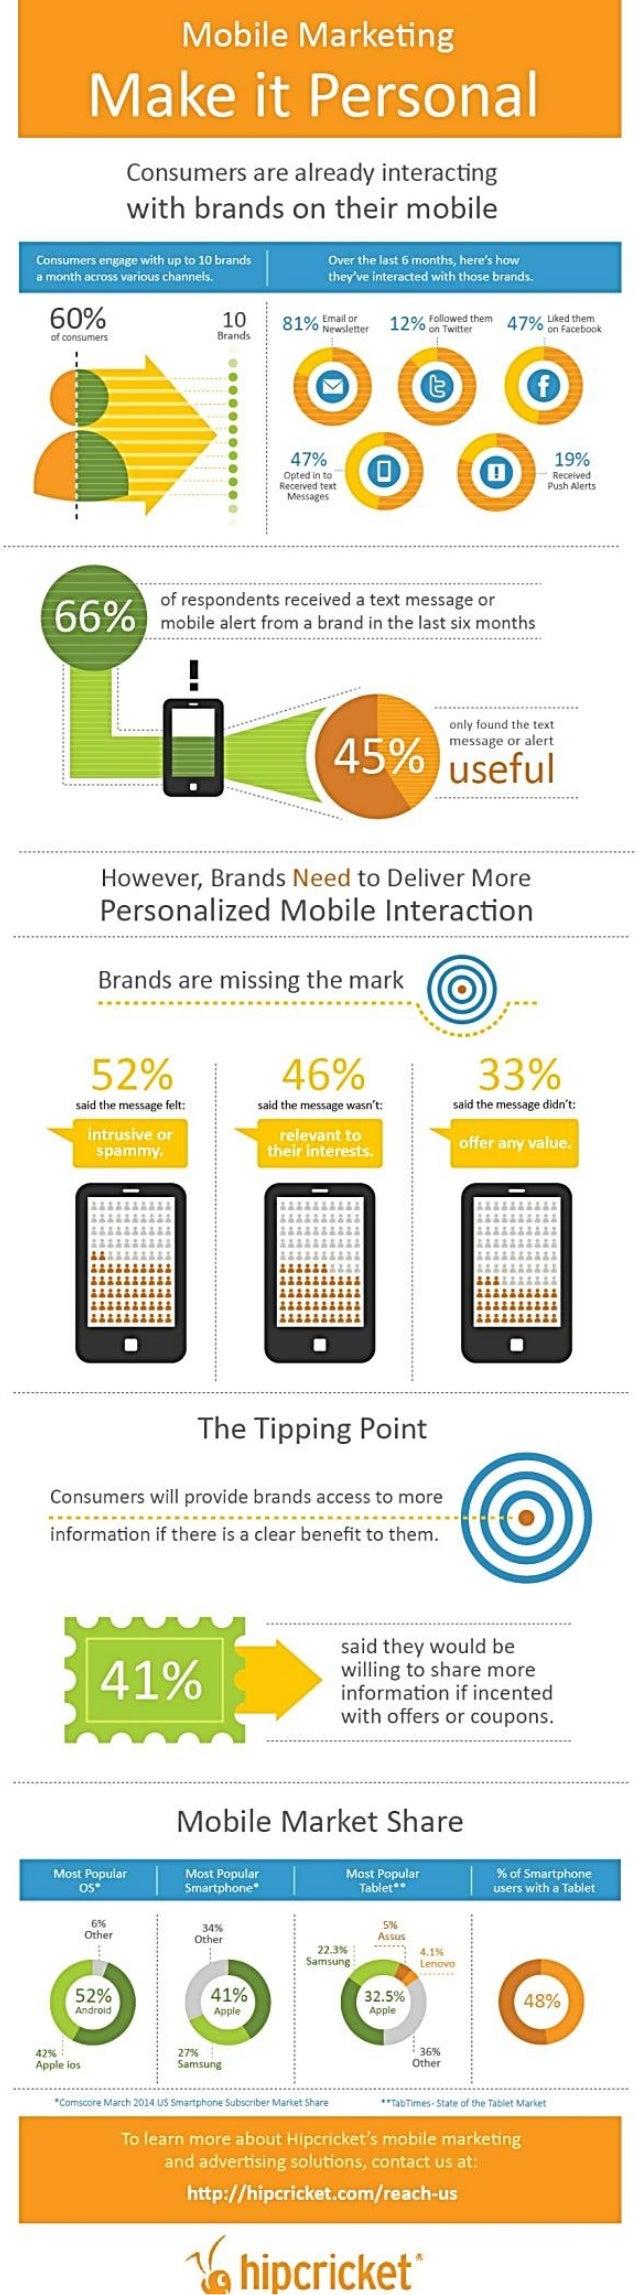 Mobile Marketing : Make it personal